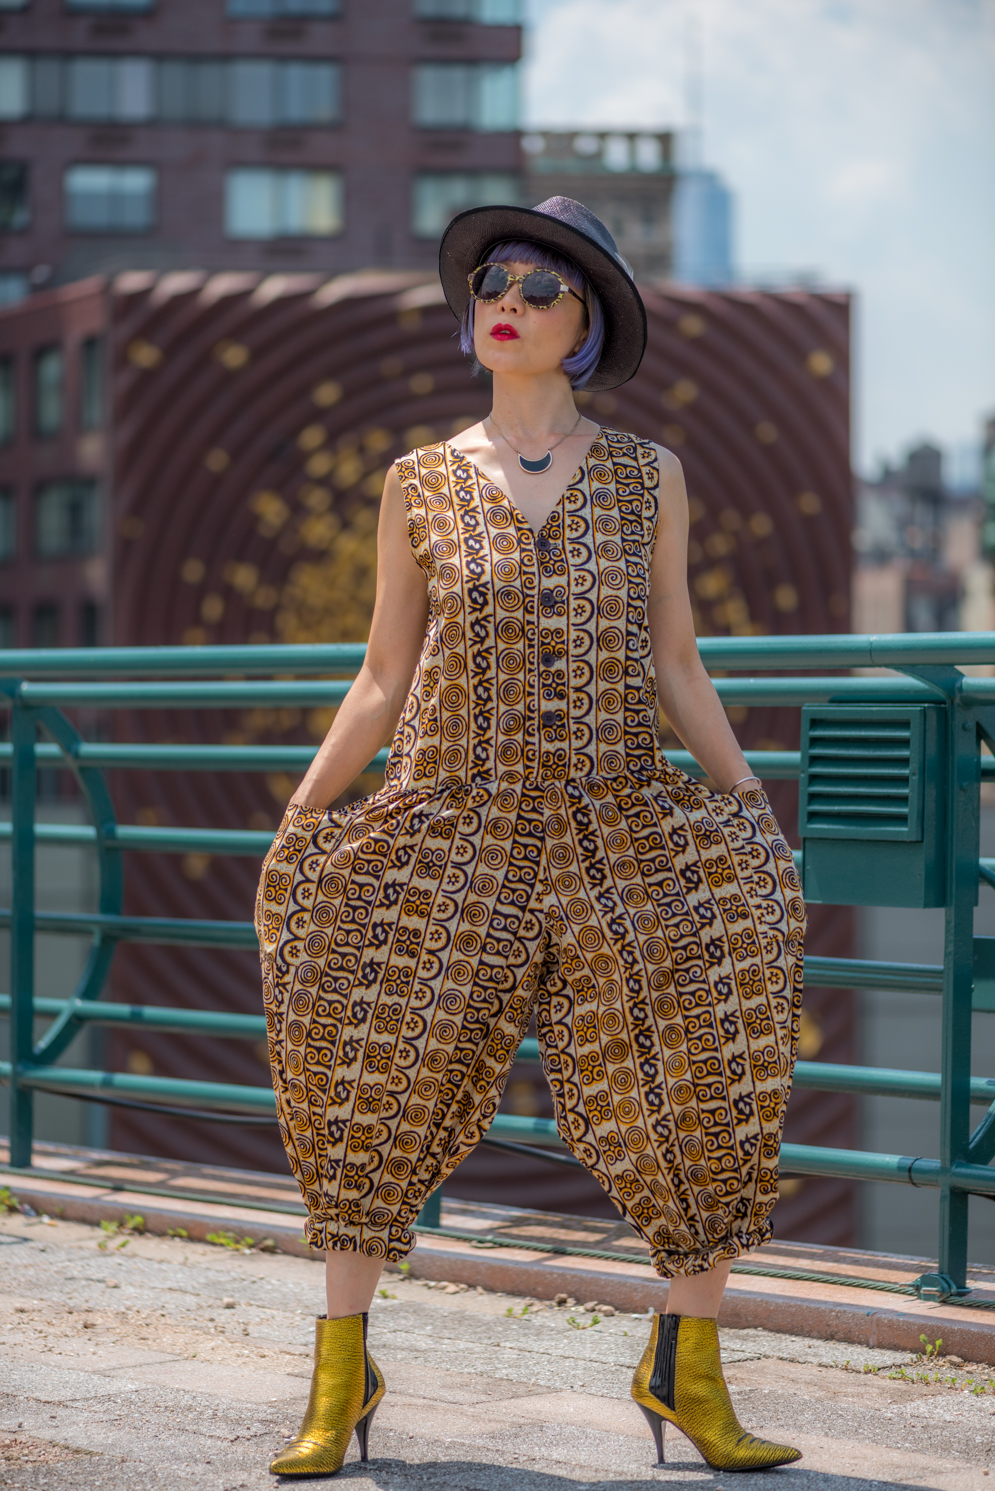 ROCK MAMA NYC LIFESTYLE BLOG - rock mama nyc vintage online shop